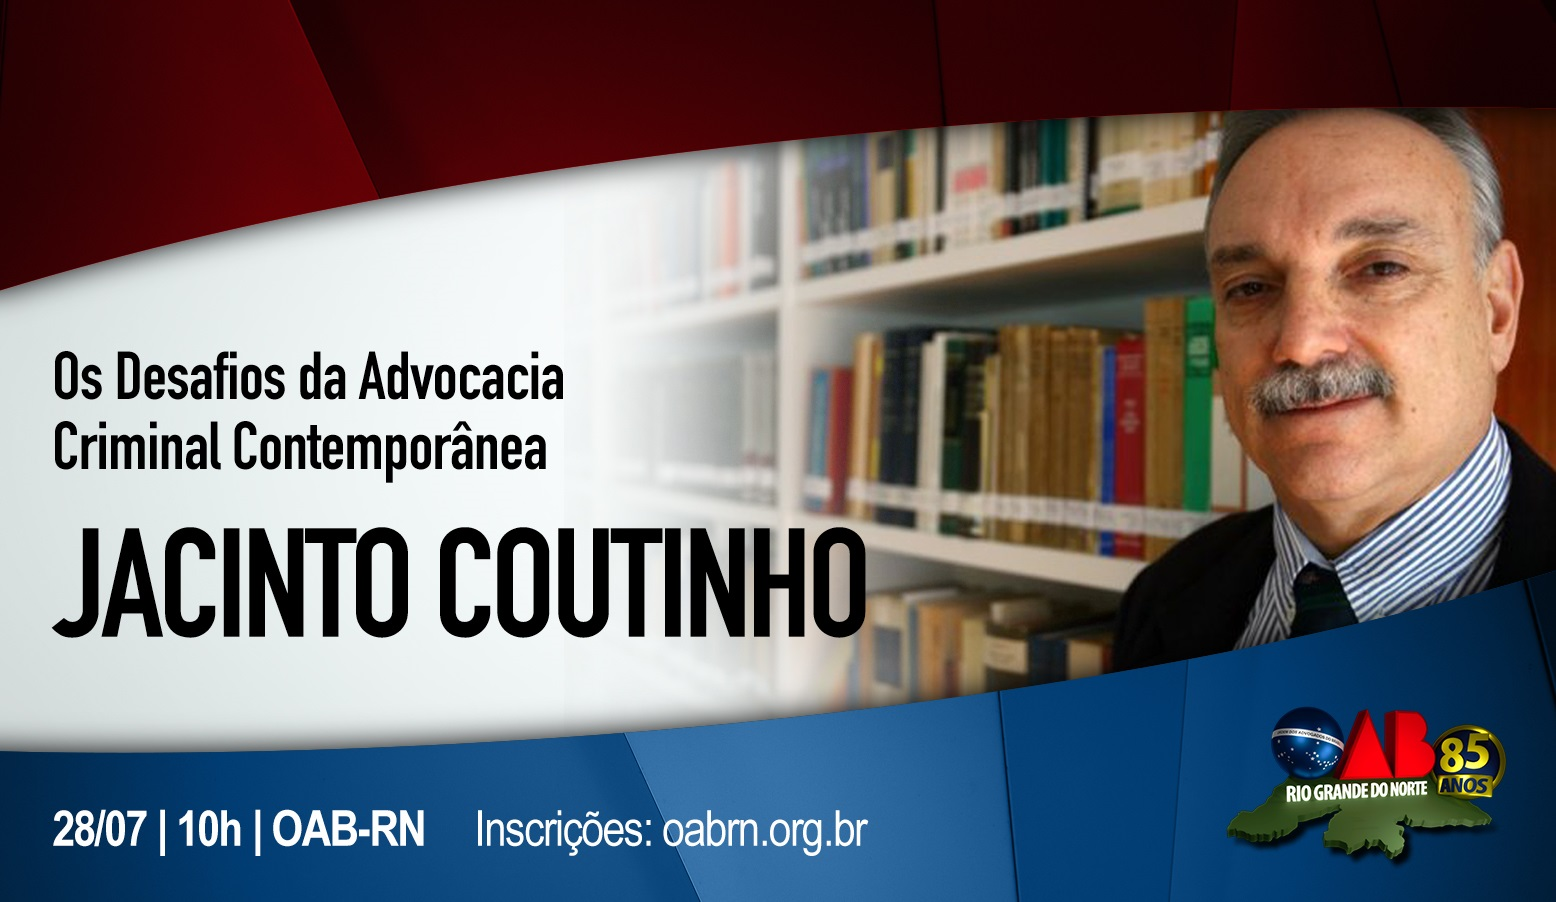 Jacinto Coutinho faz palestra na OAB-RN